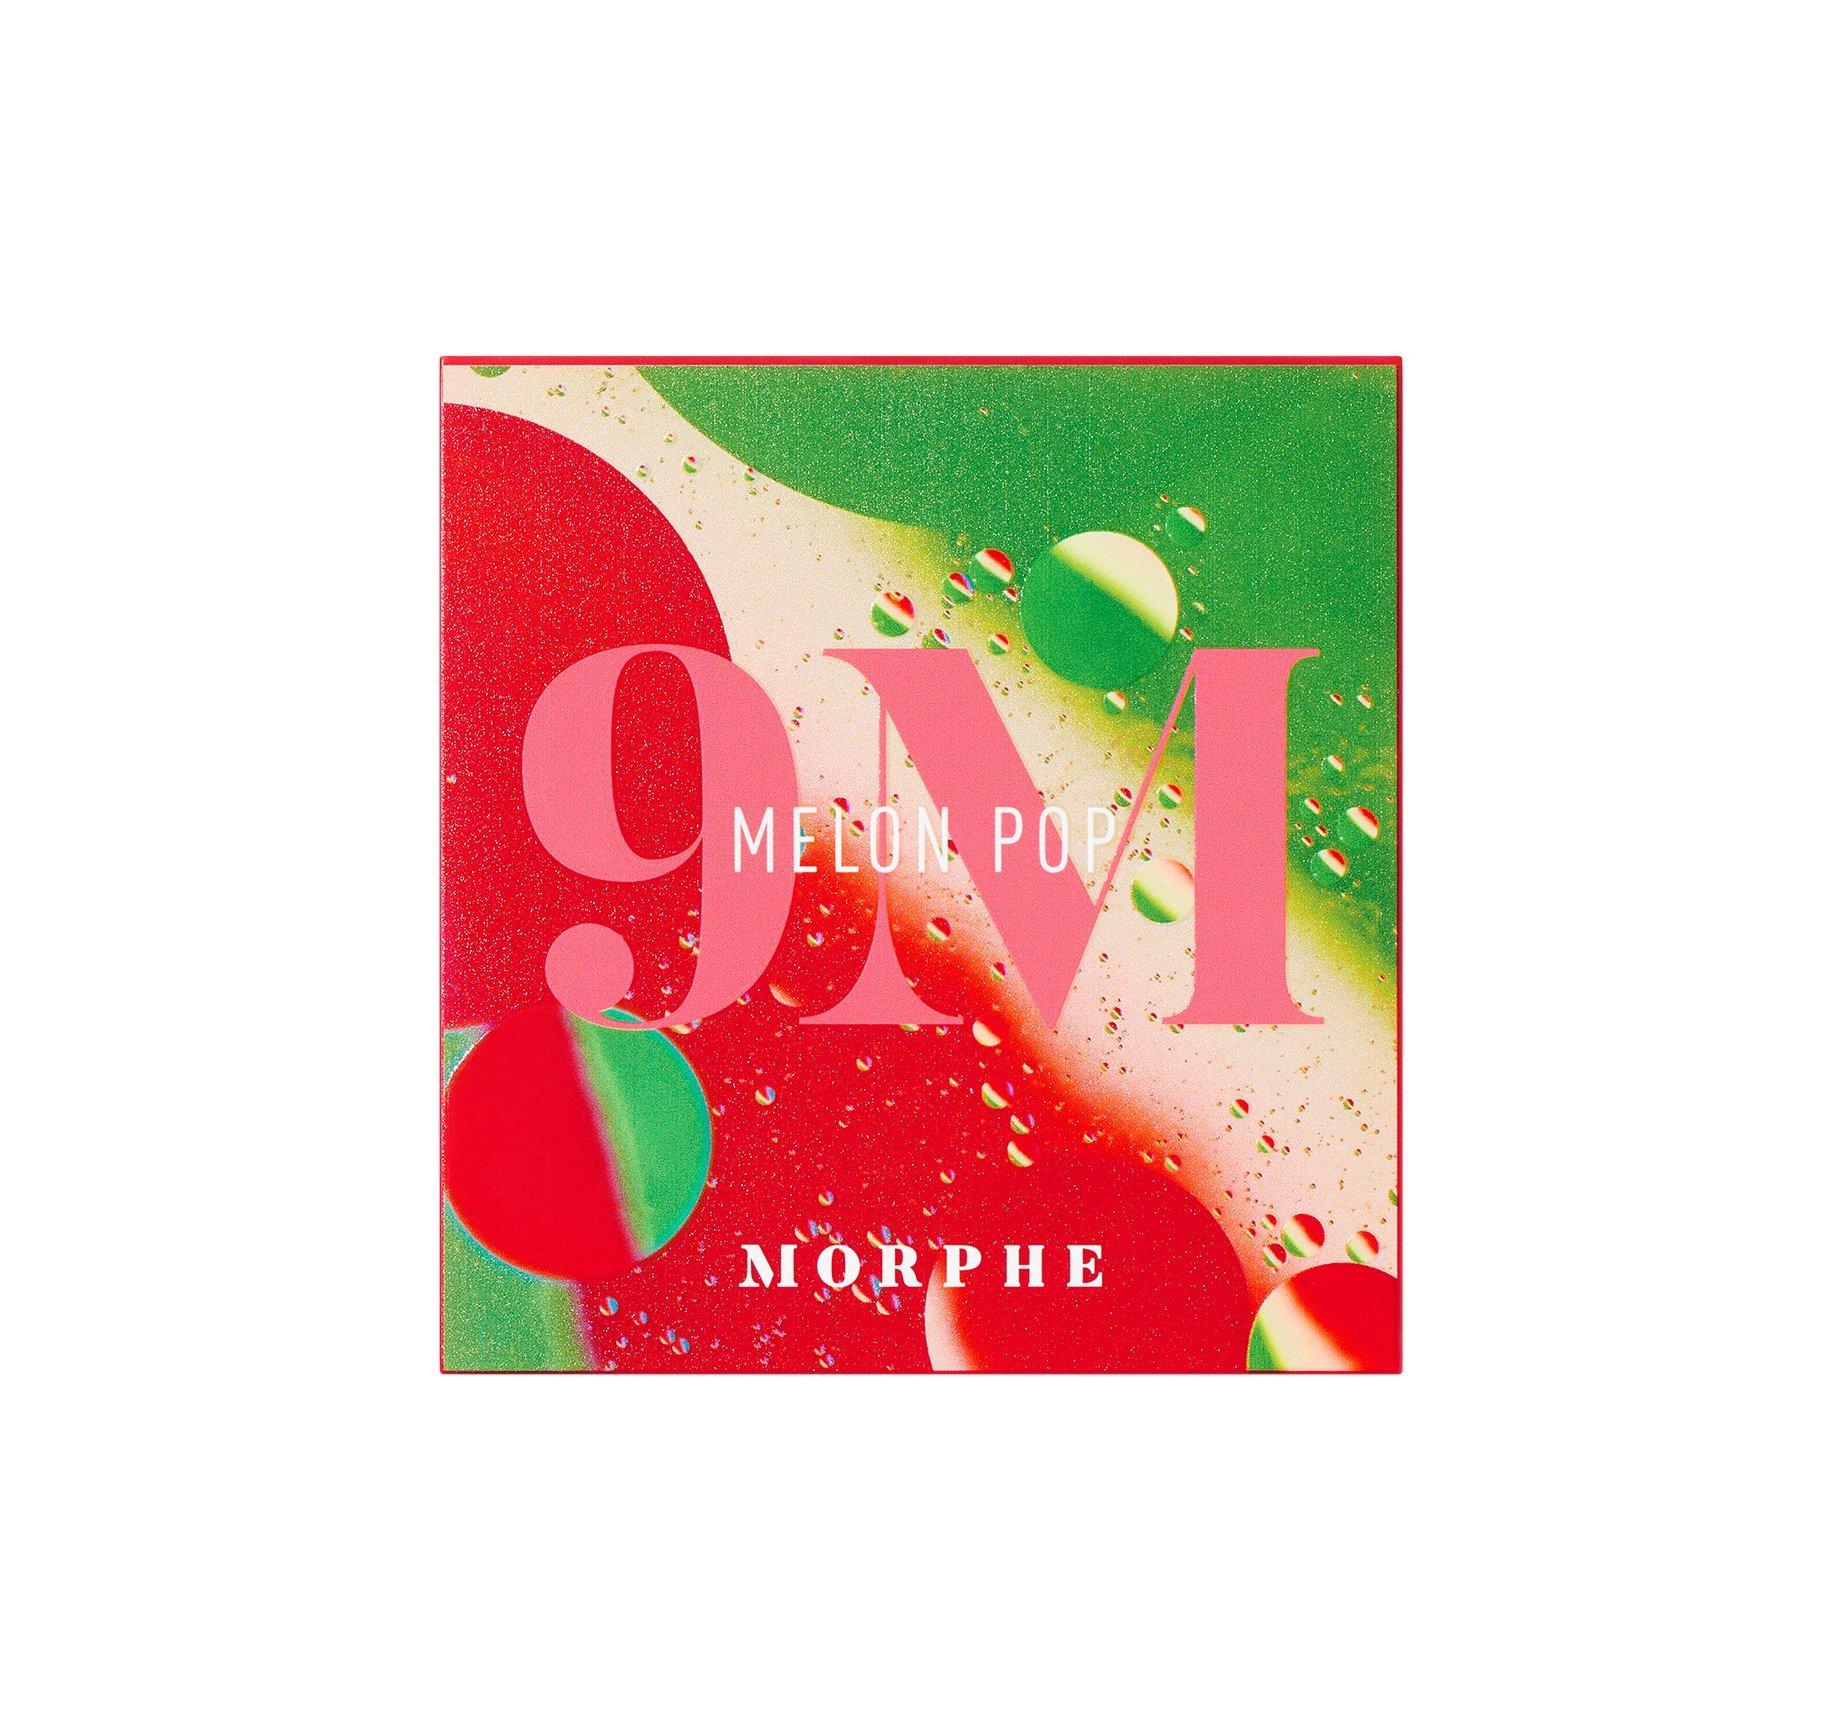 Morphe 9M Melon Pop Artistry Palette